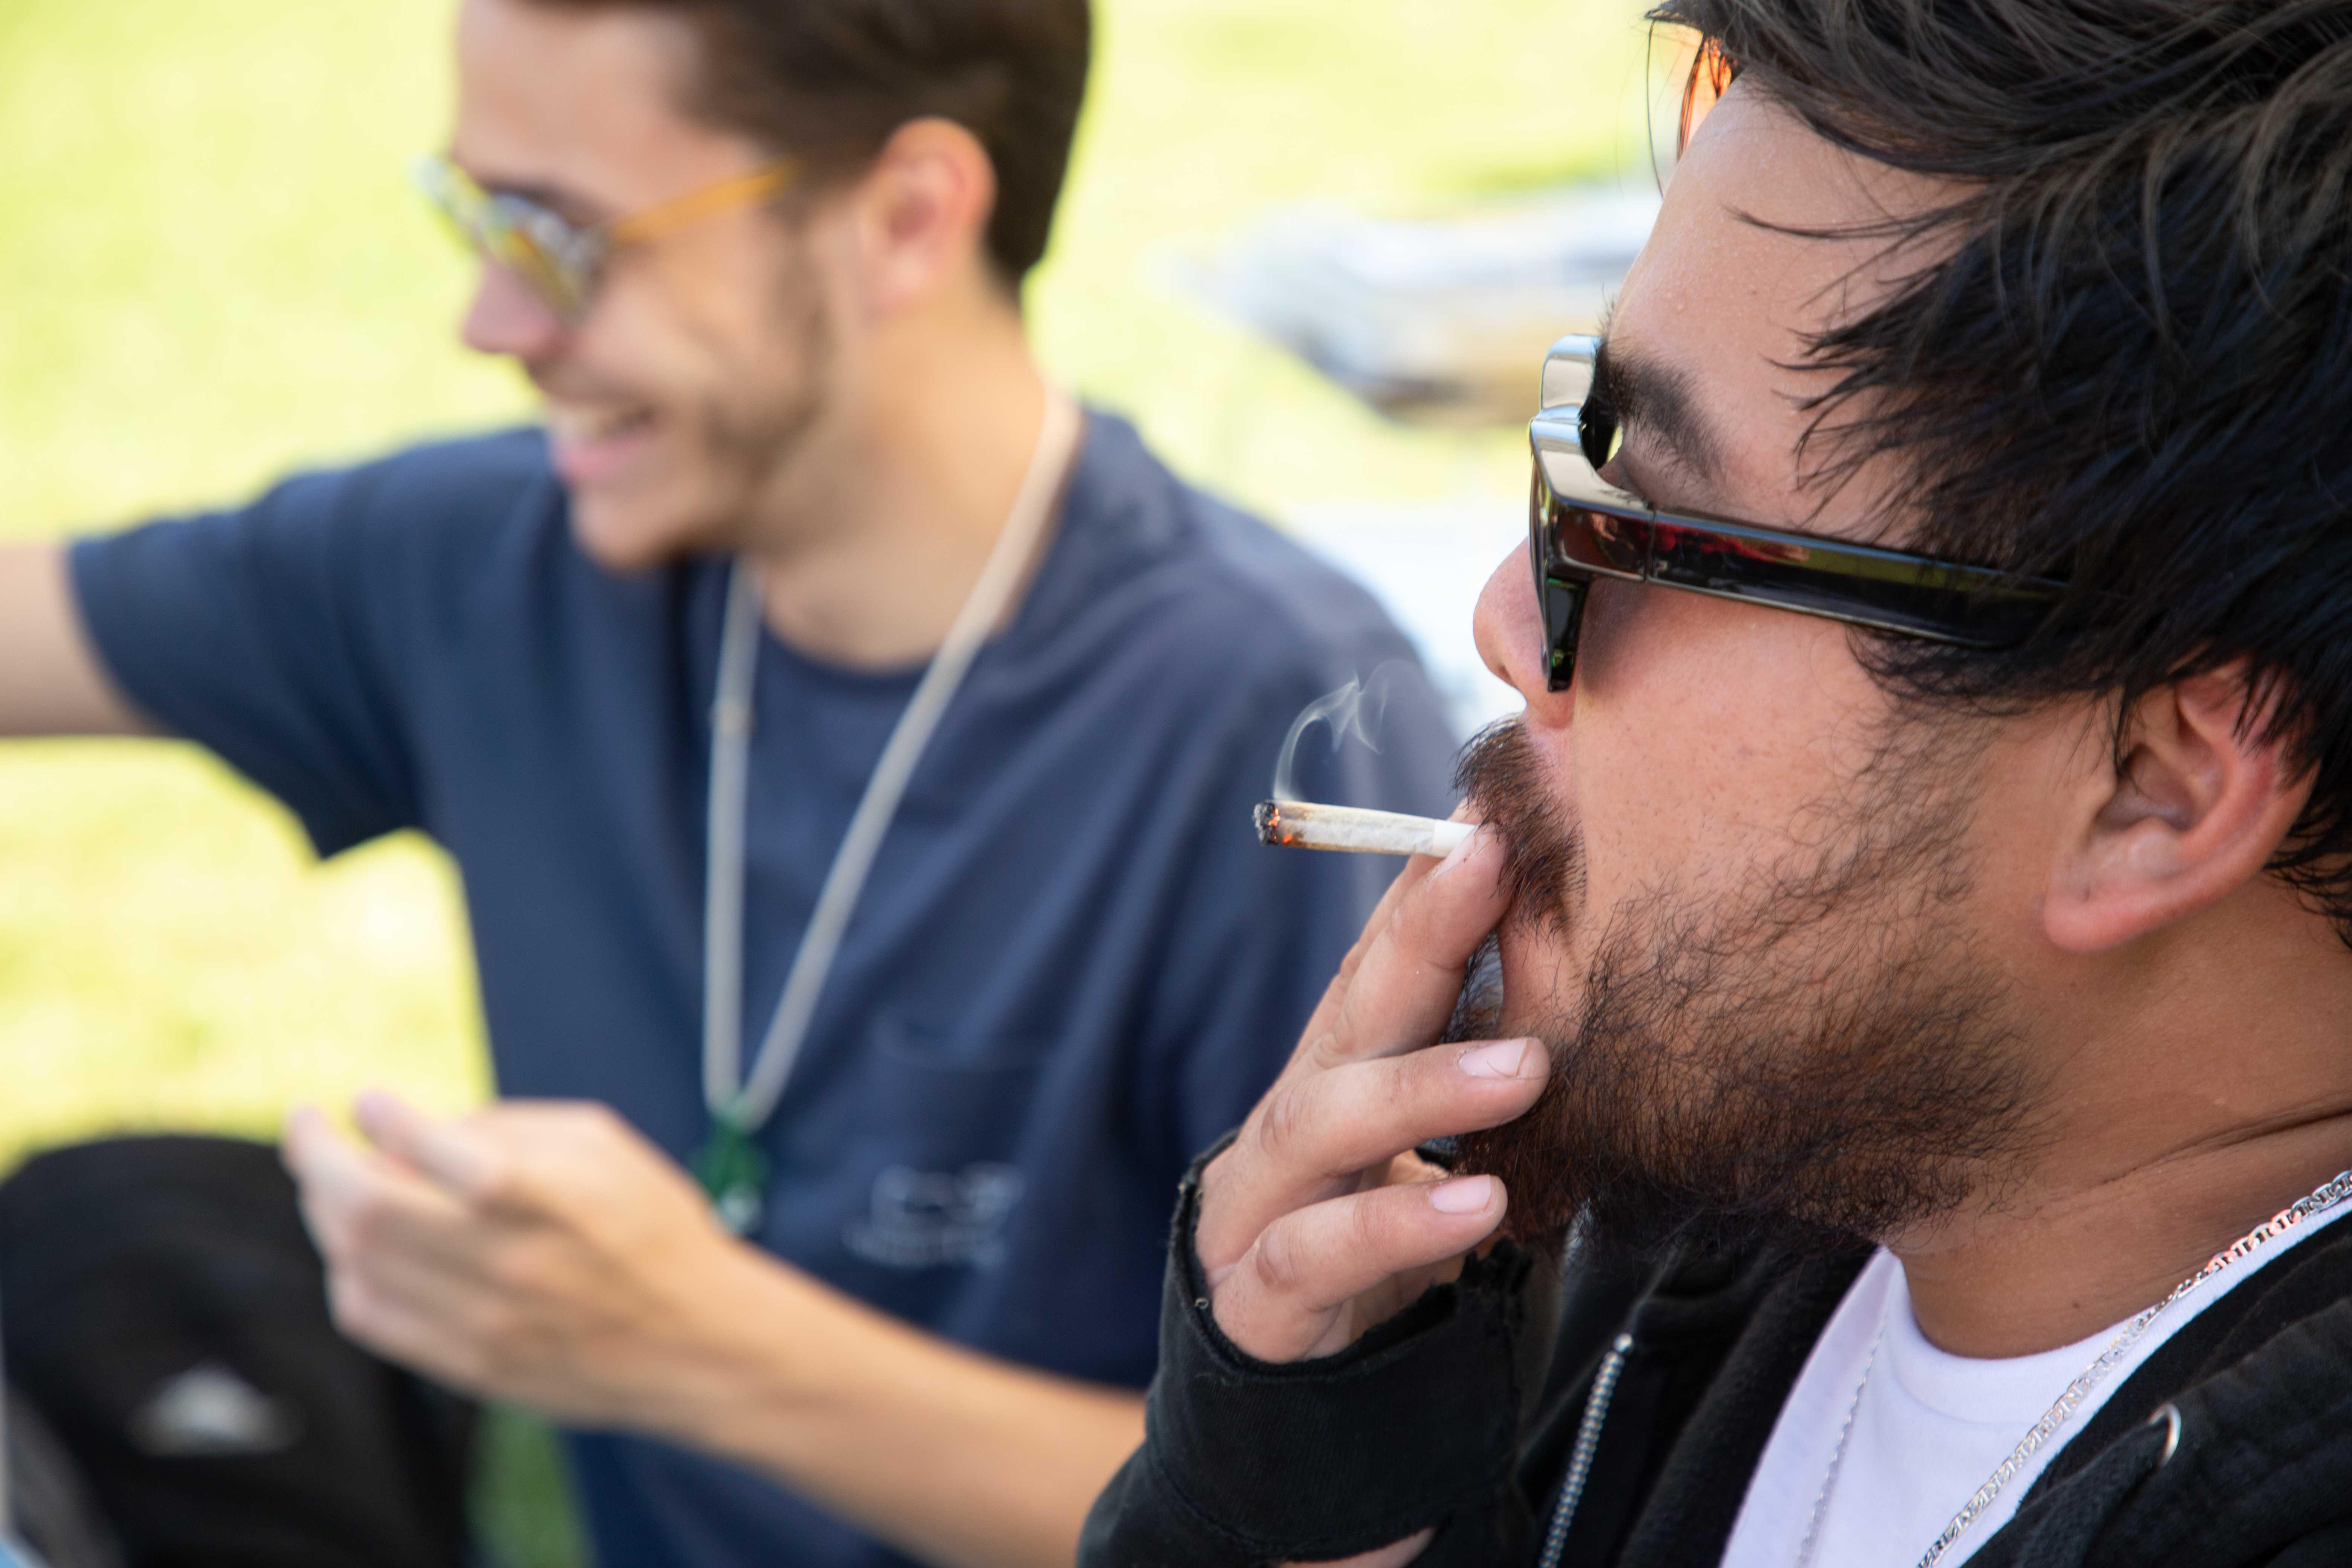 Ashton Chan, at right, of Waltham smokes with Michael Gordon of Framingham Sunday at the Boston Freedom Rally for legalized marijuana Sunday, Sept. 16 on Boston Common. / Photo by Riley Robinson